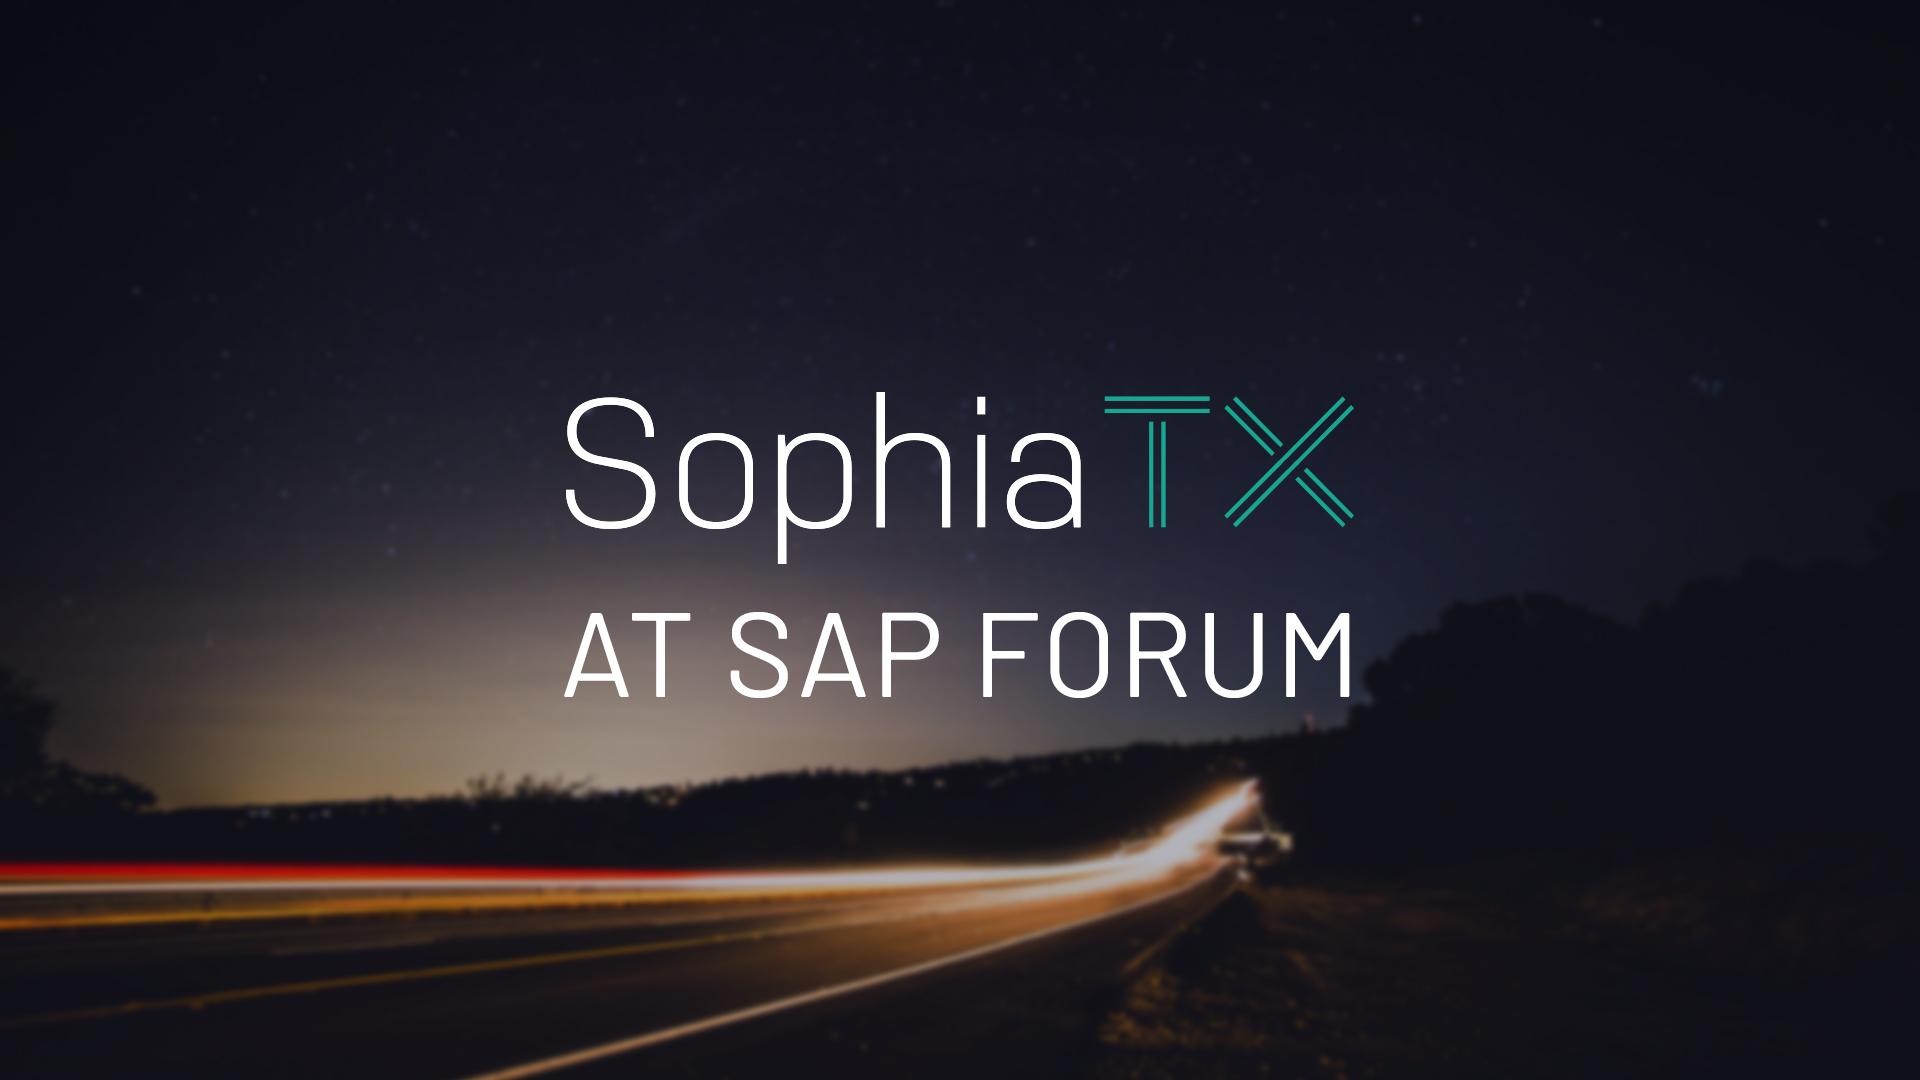 SophiaTX Presented to over 500 professionals at SAP Forum